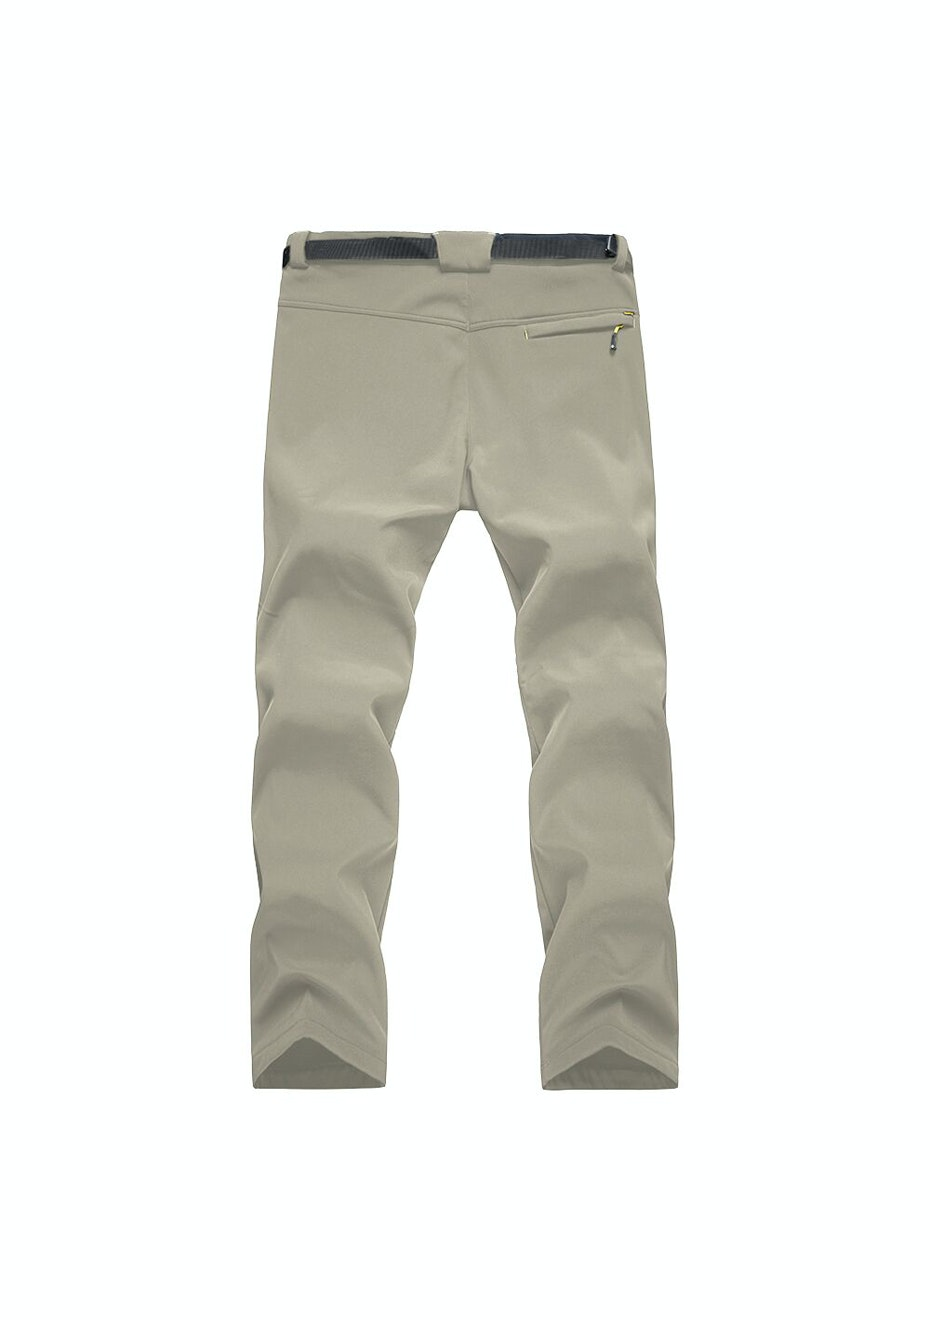 Men 2-in-1 WaterProof Pants - Beige